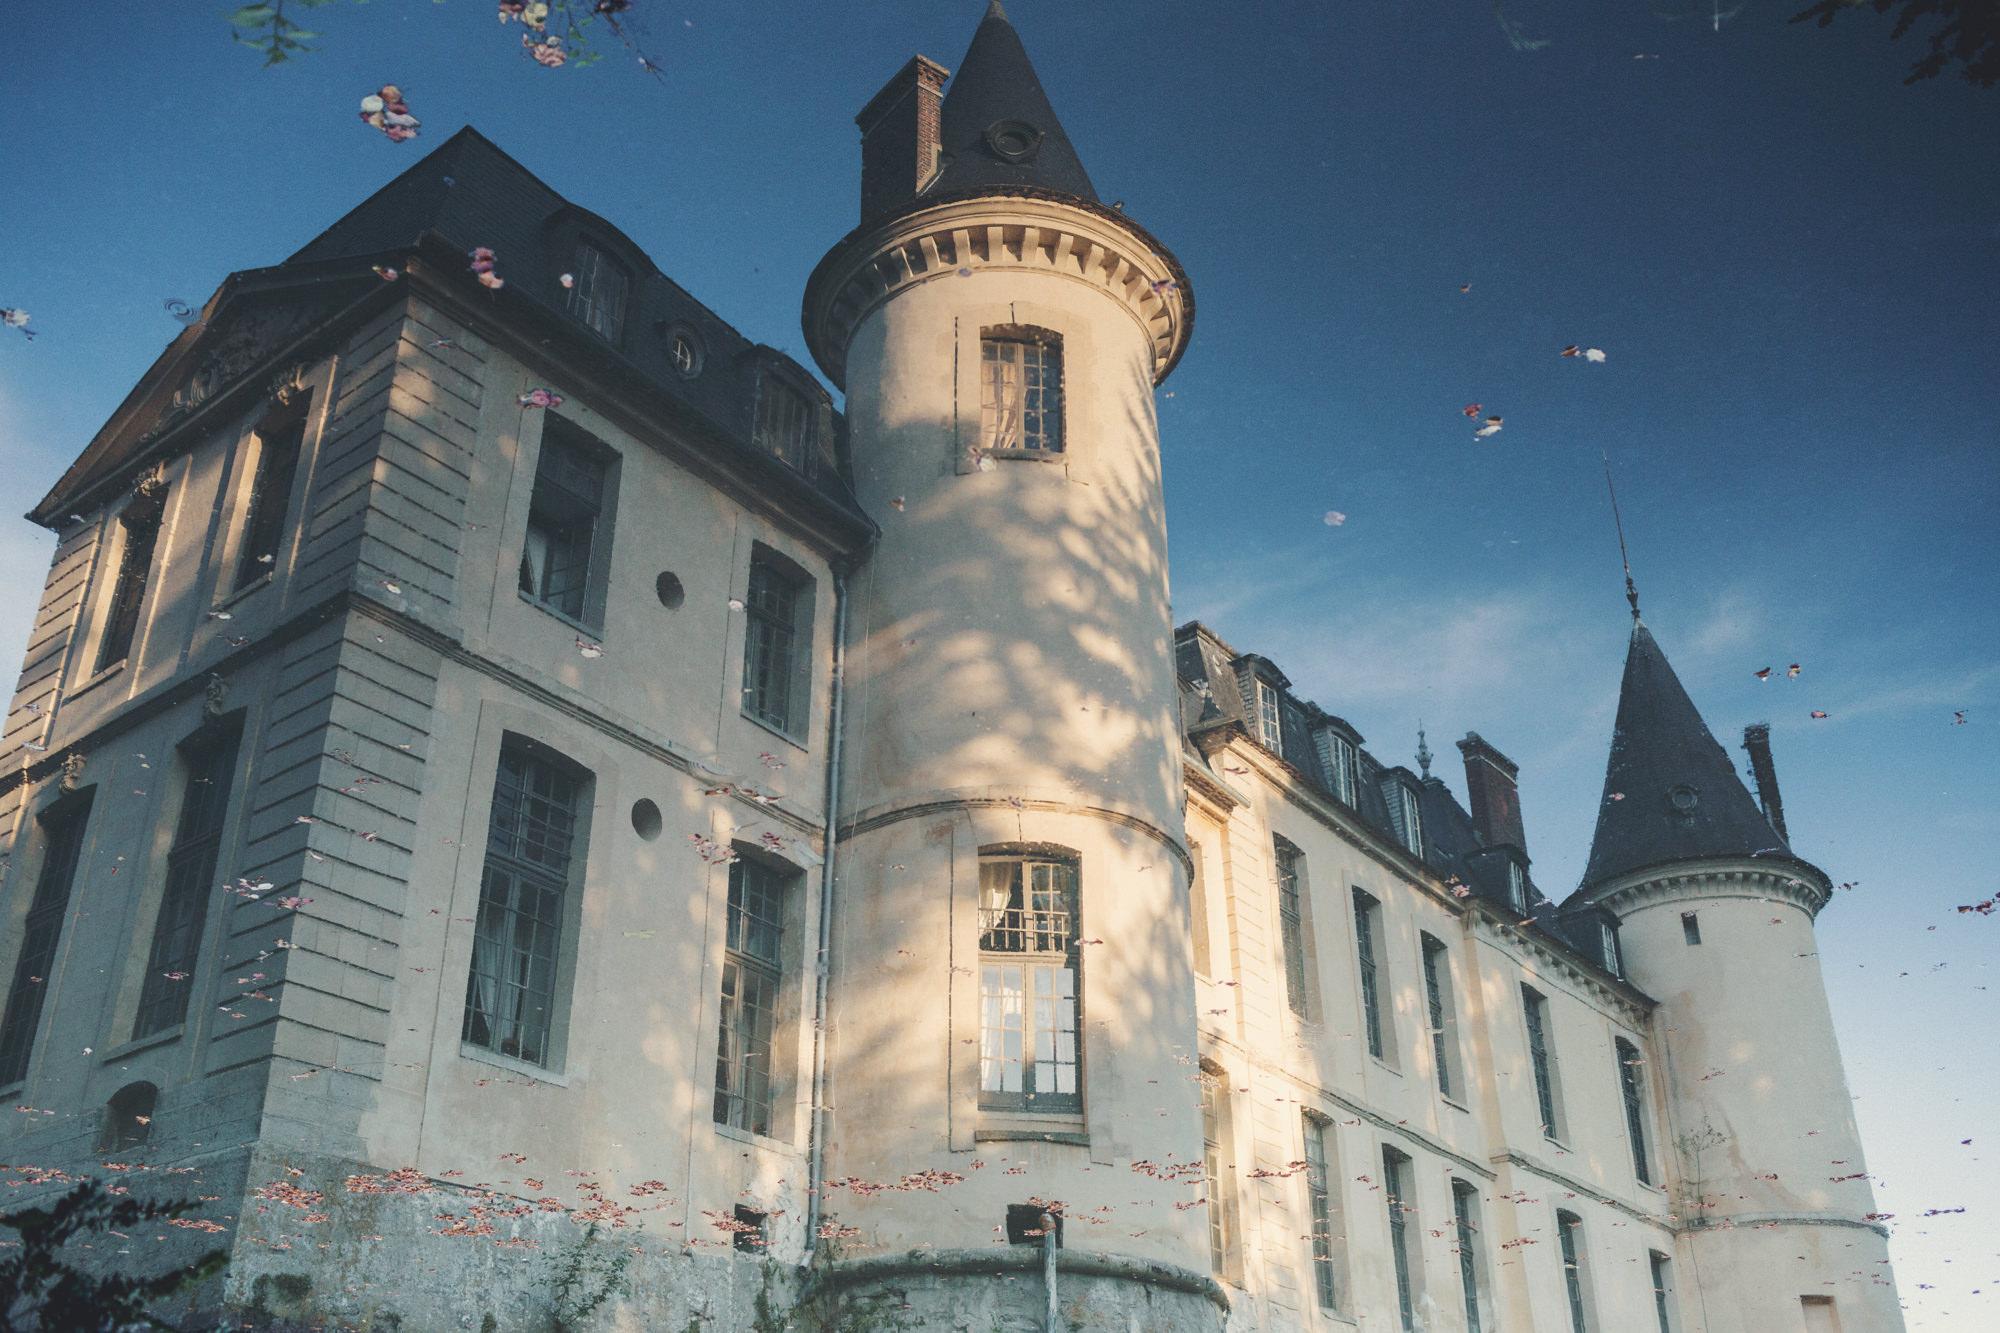 mariage au chateau dermenonvilleanne claire brun 69 - Chateau D Ermenonville Mariage